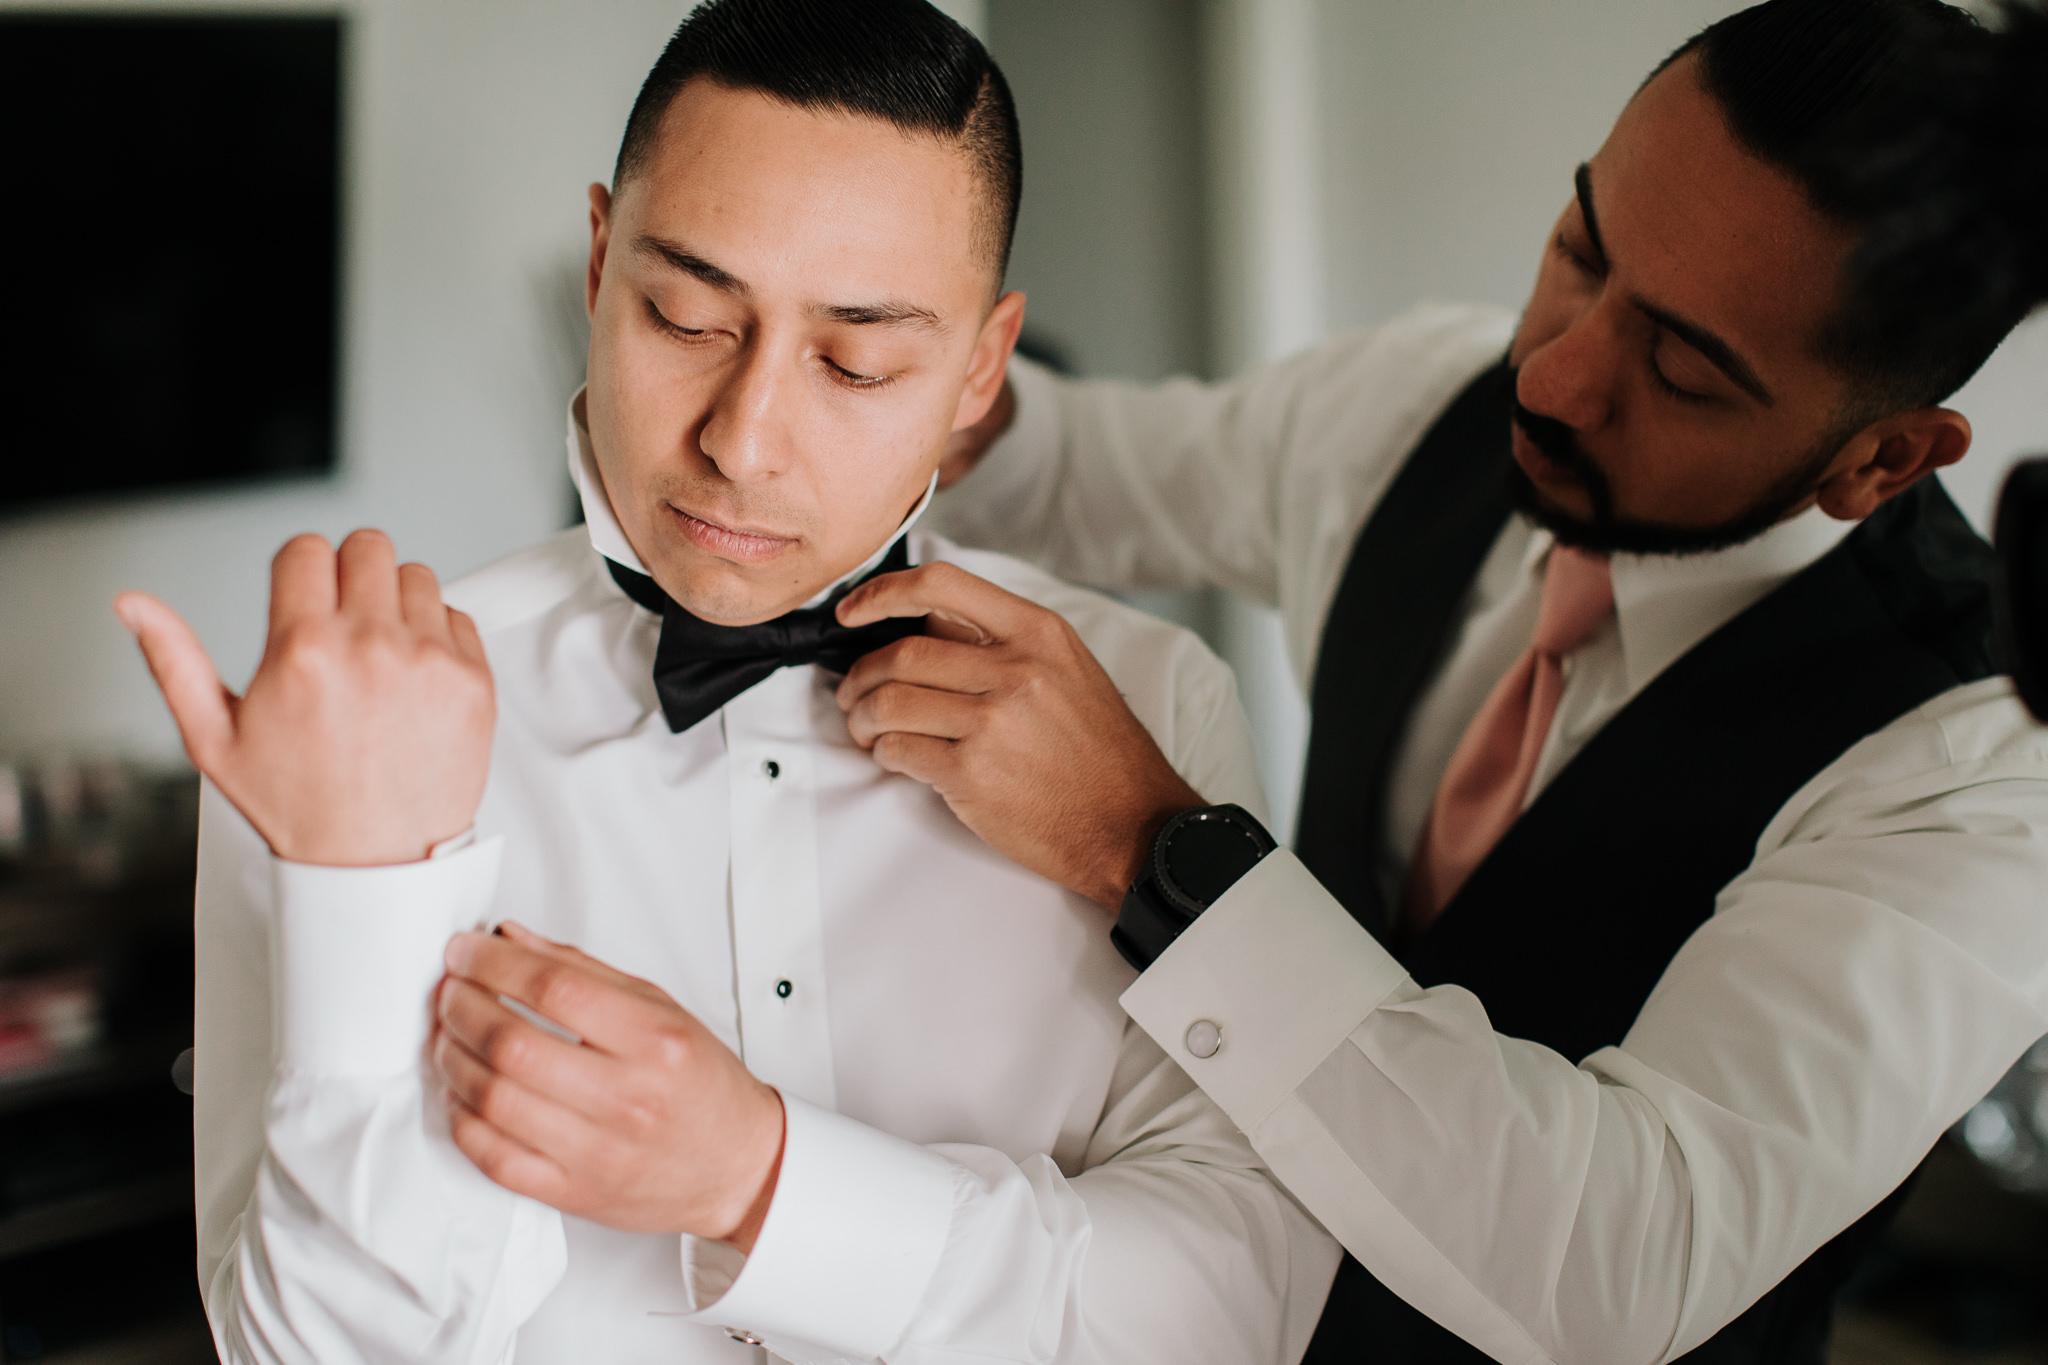 2019-04-05_Brittany_and_Nick_-_Married_-_San_Juan_Capistrano-6.jpg